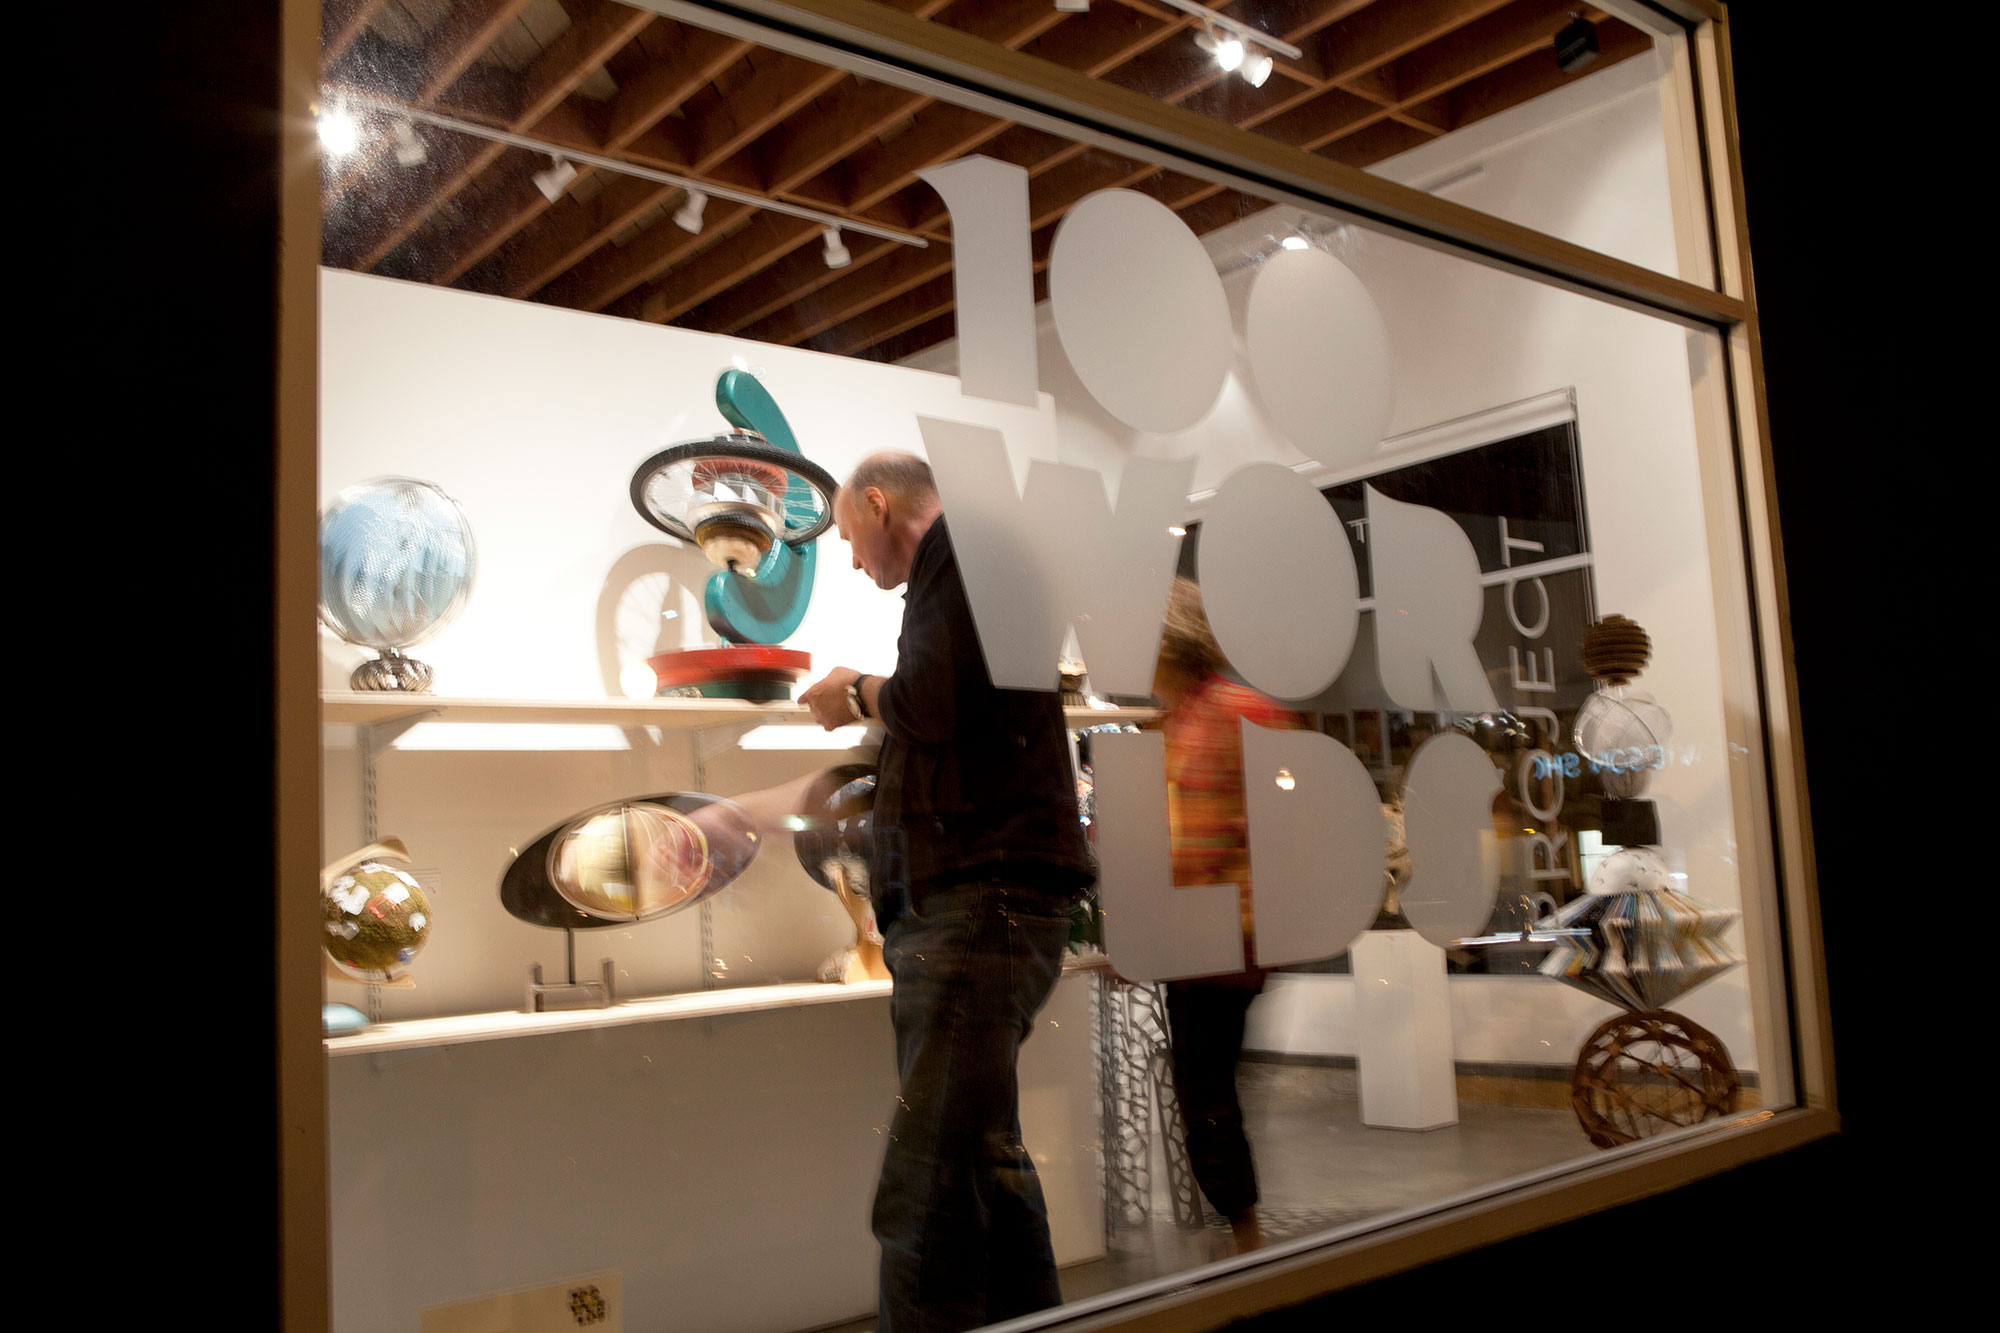 ron-miriello-grafico-san-diego-100-worlds-project-sculpture-globe-Miriello-branding-officina-01.jpg